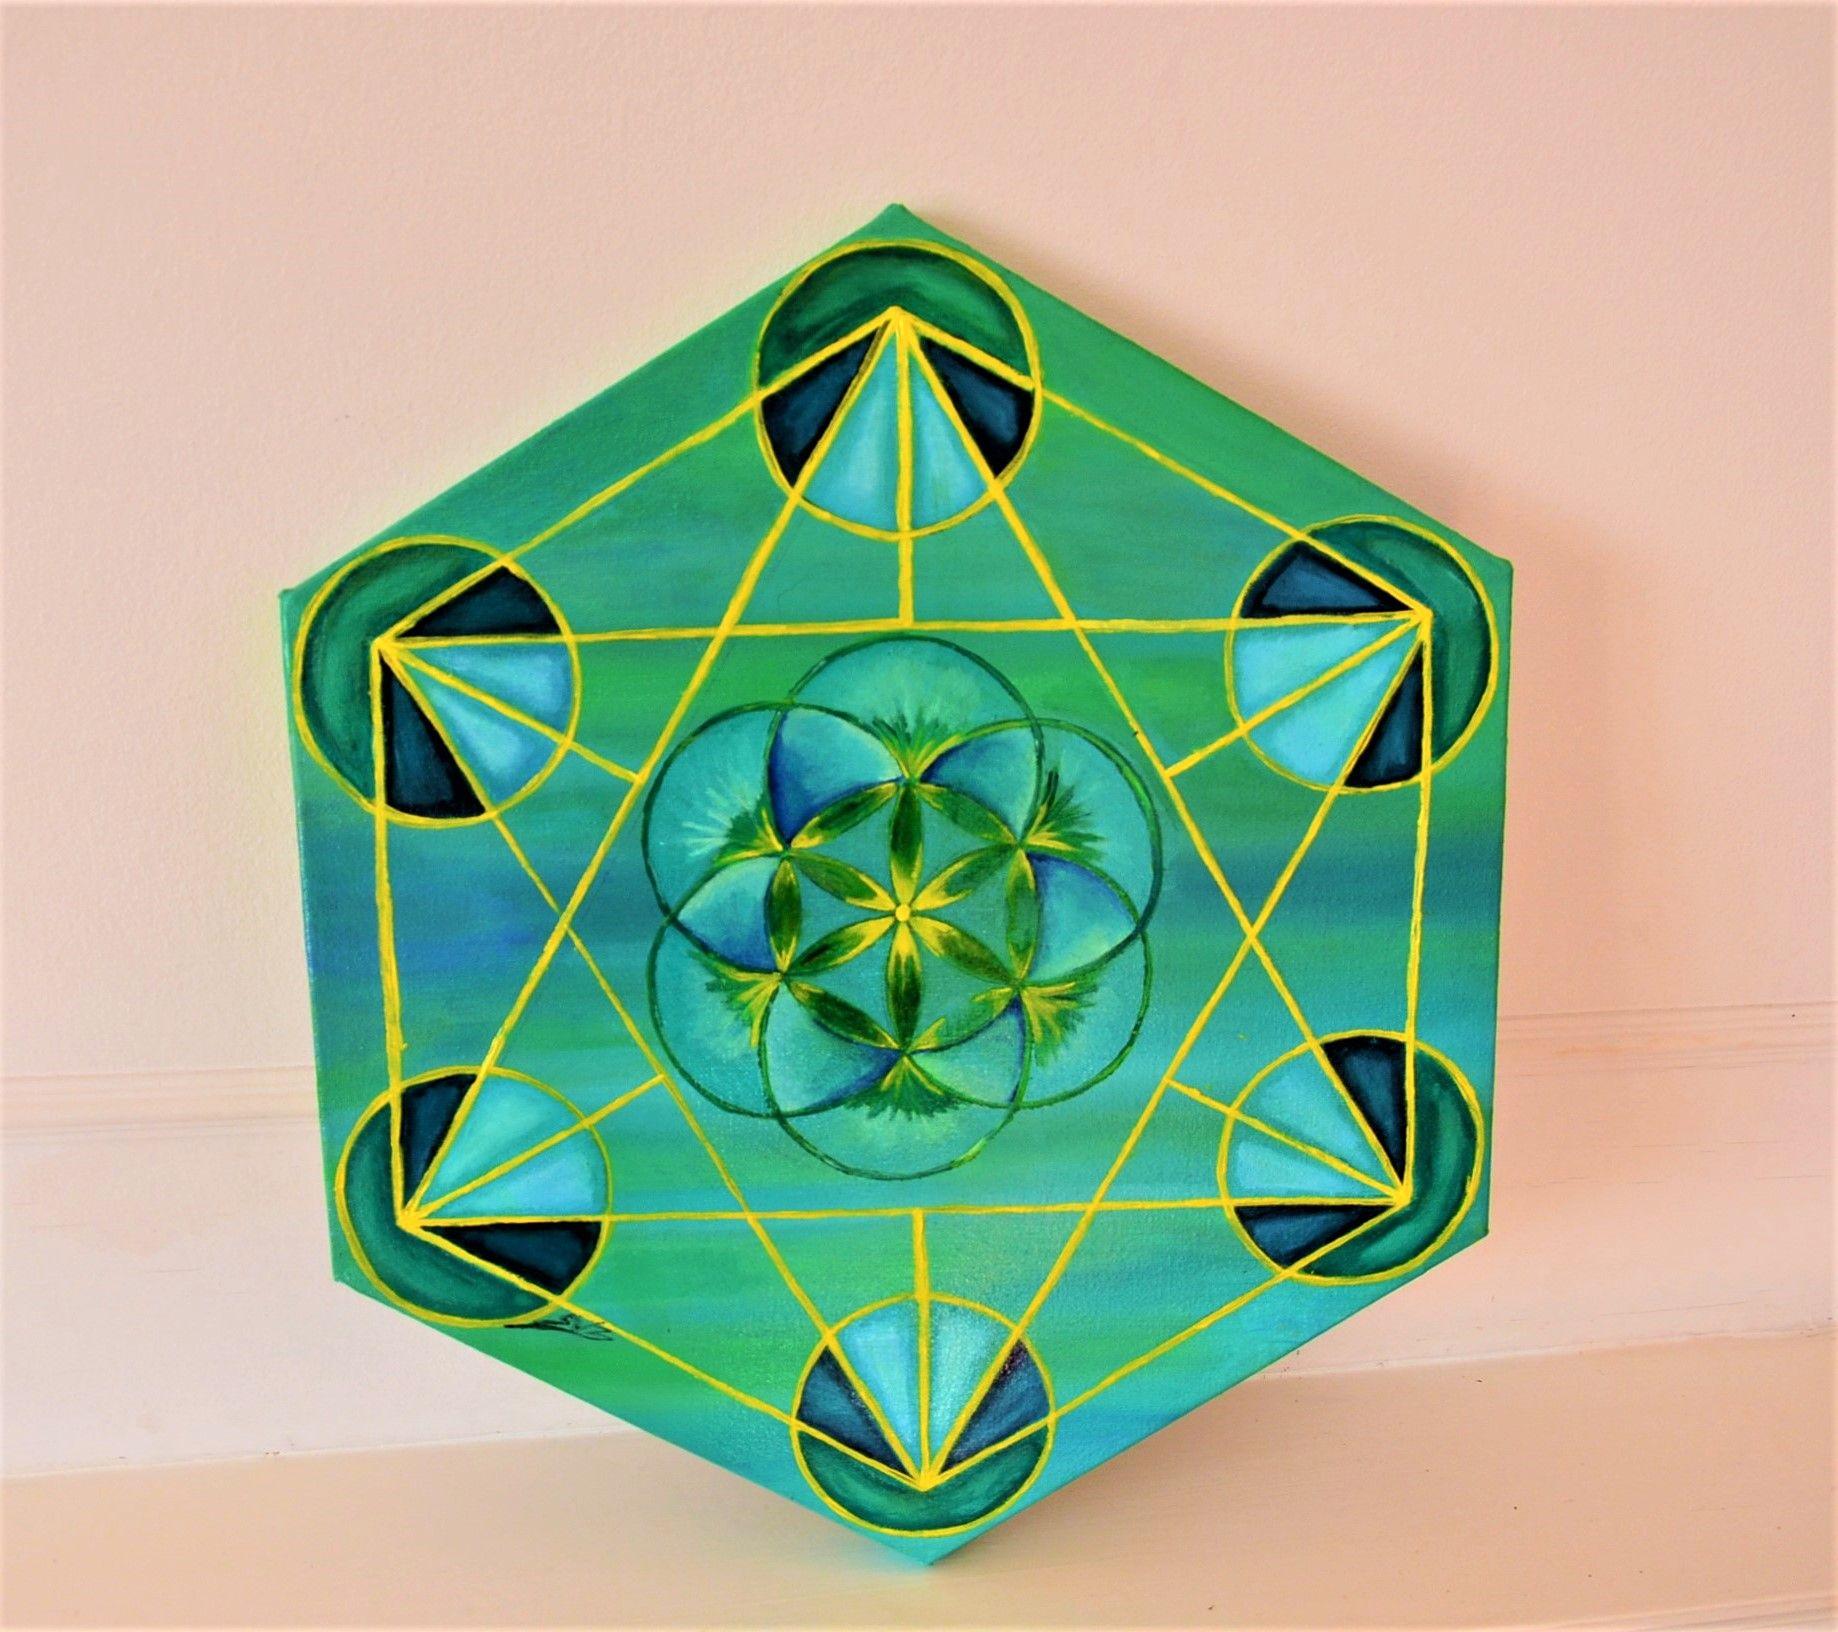 40cm x 40cm on canvas board acrylic sacredgeometry art